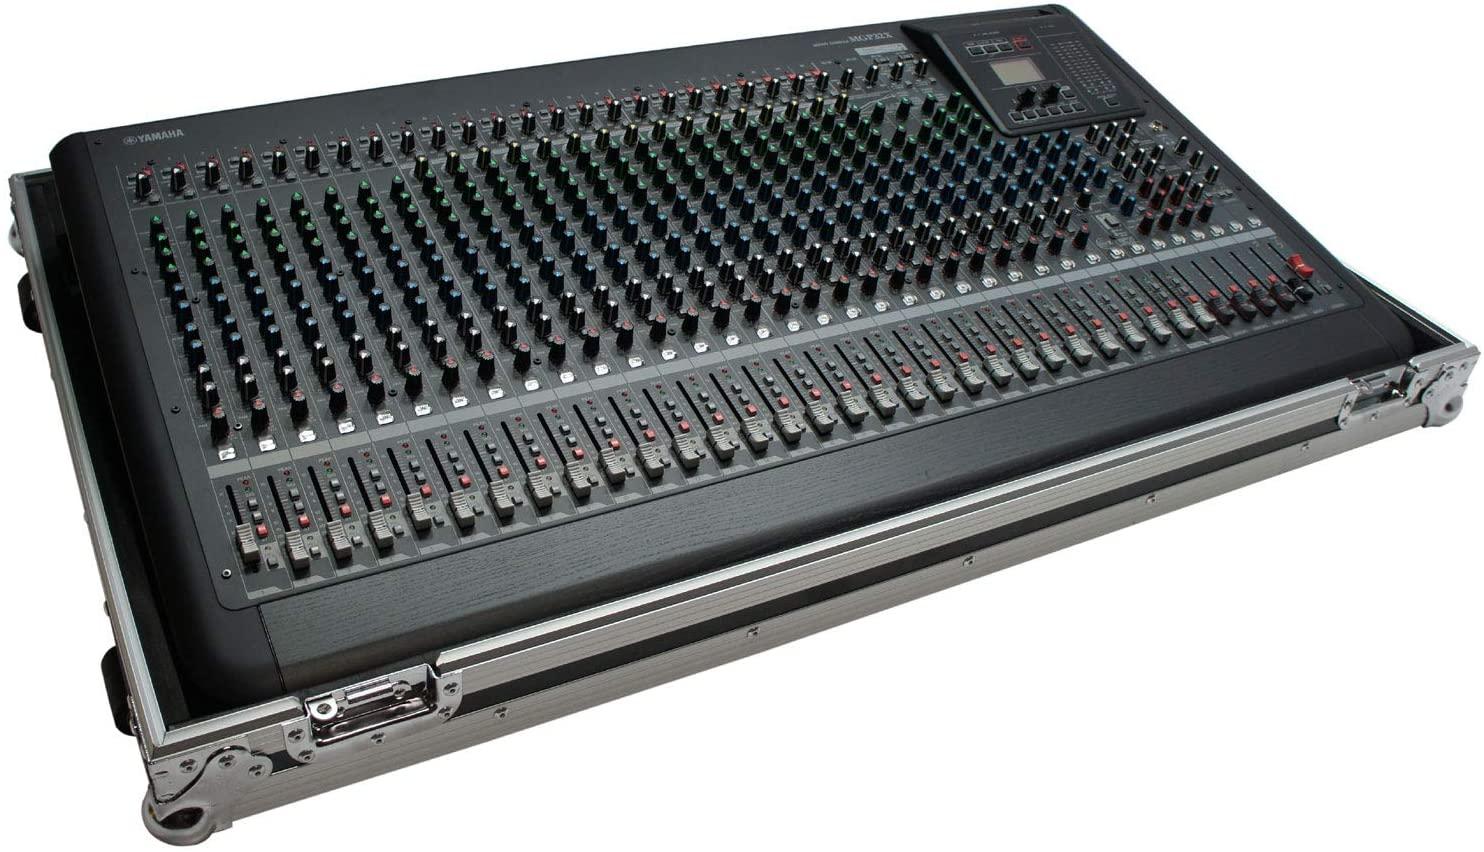 Harmony HCMGP32 Flight Transport Road Custom Audio Case Compatible with Yamaha MGP32X Mixer